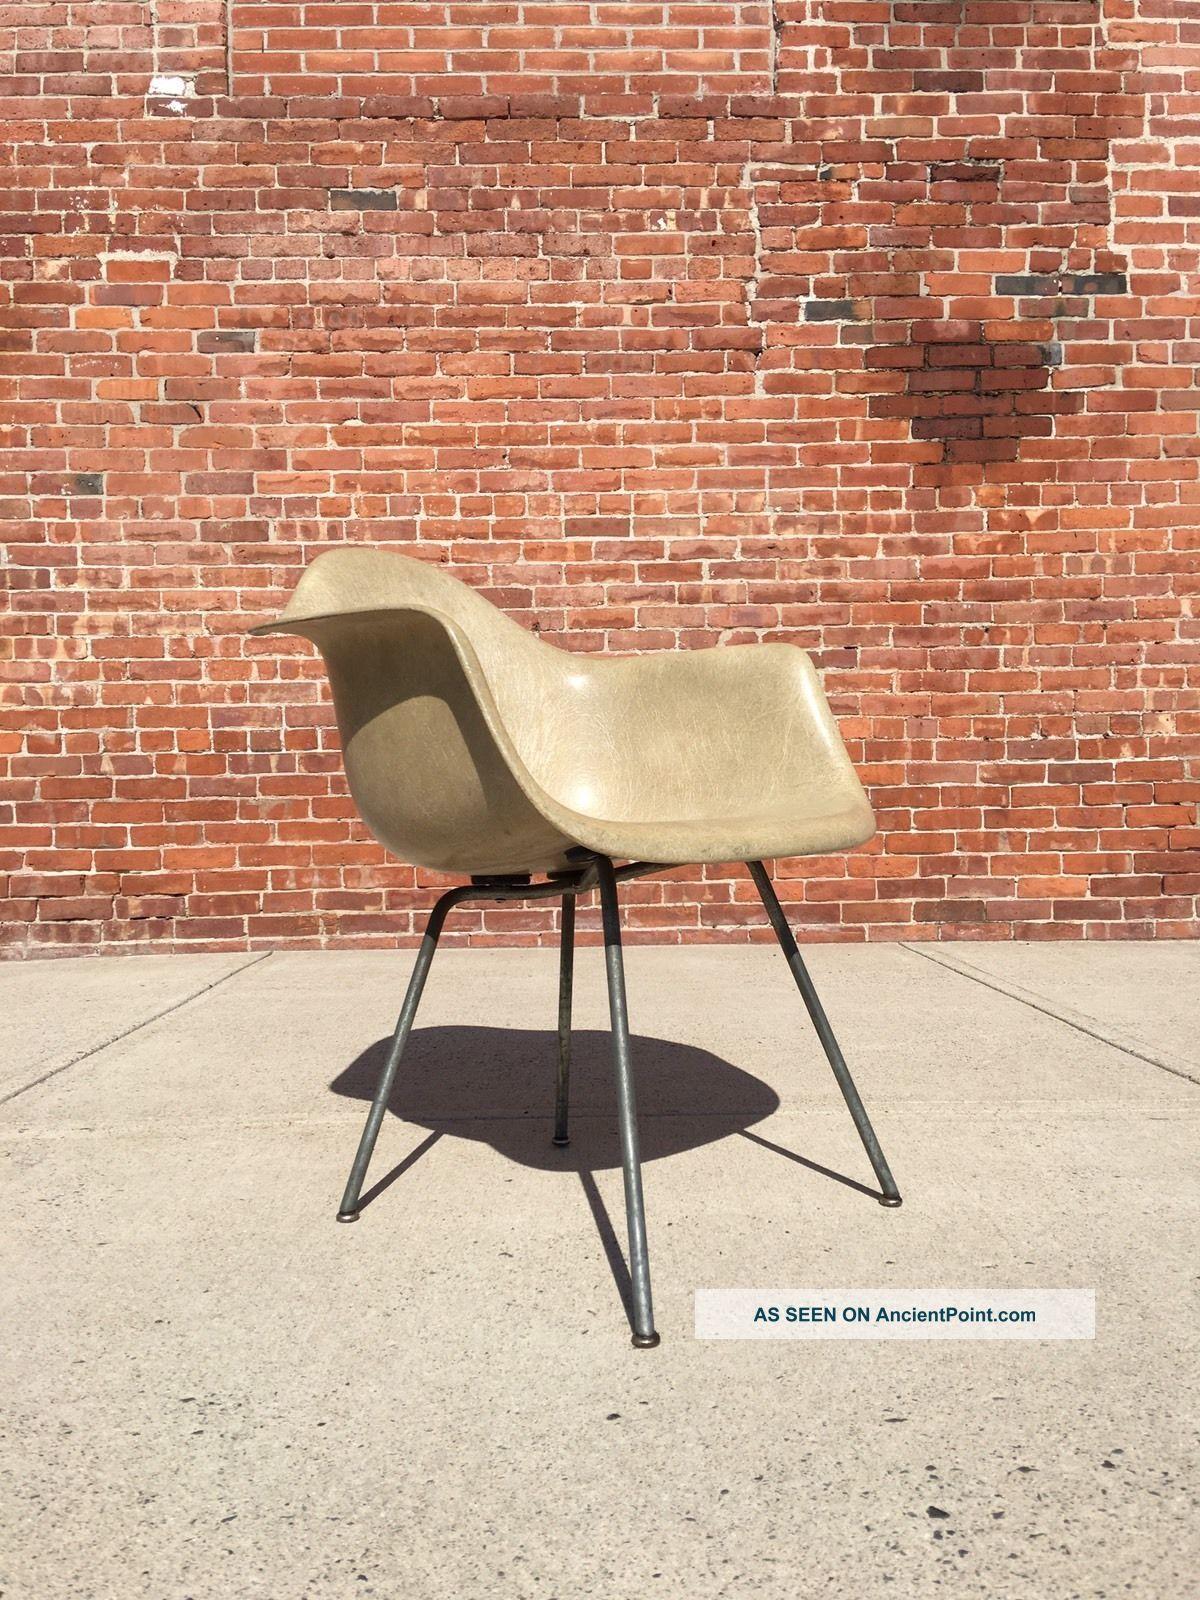 Herman Miller | Rope Edge Greige Arm Shell Zenith | Mid Century Eames Mid-Century Modernism photo